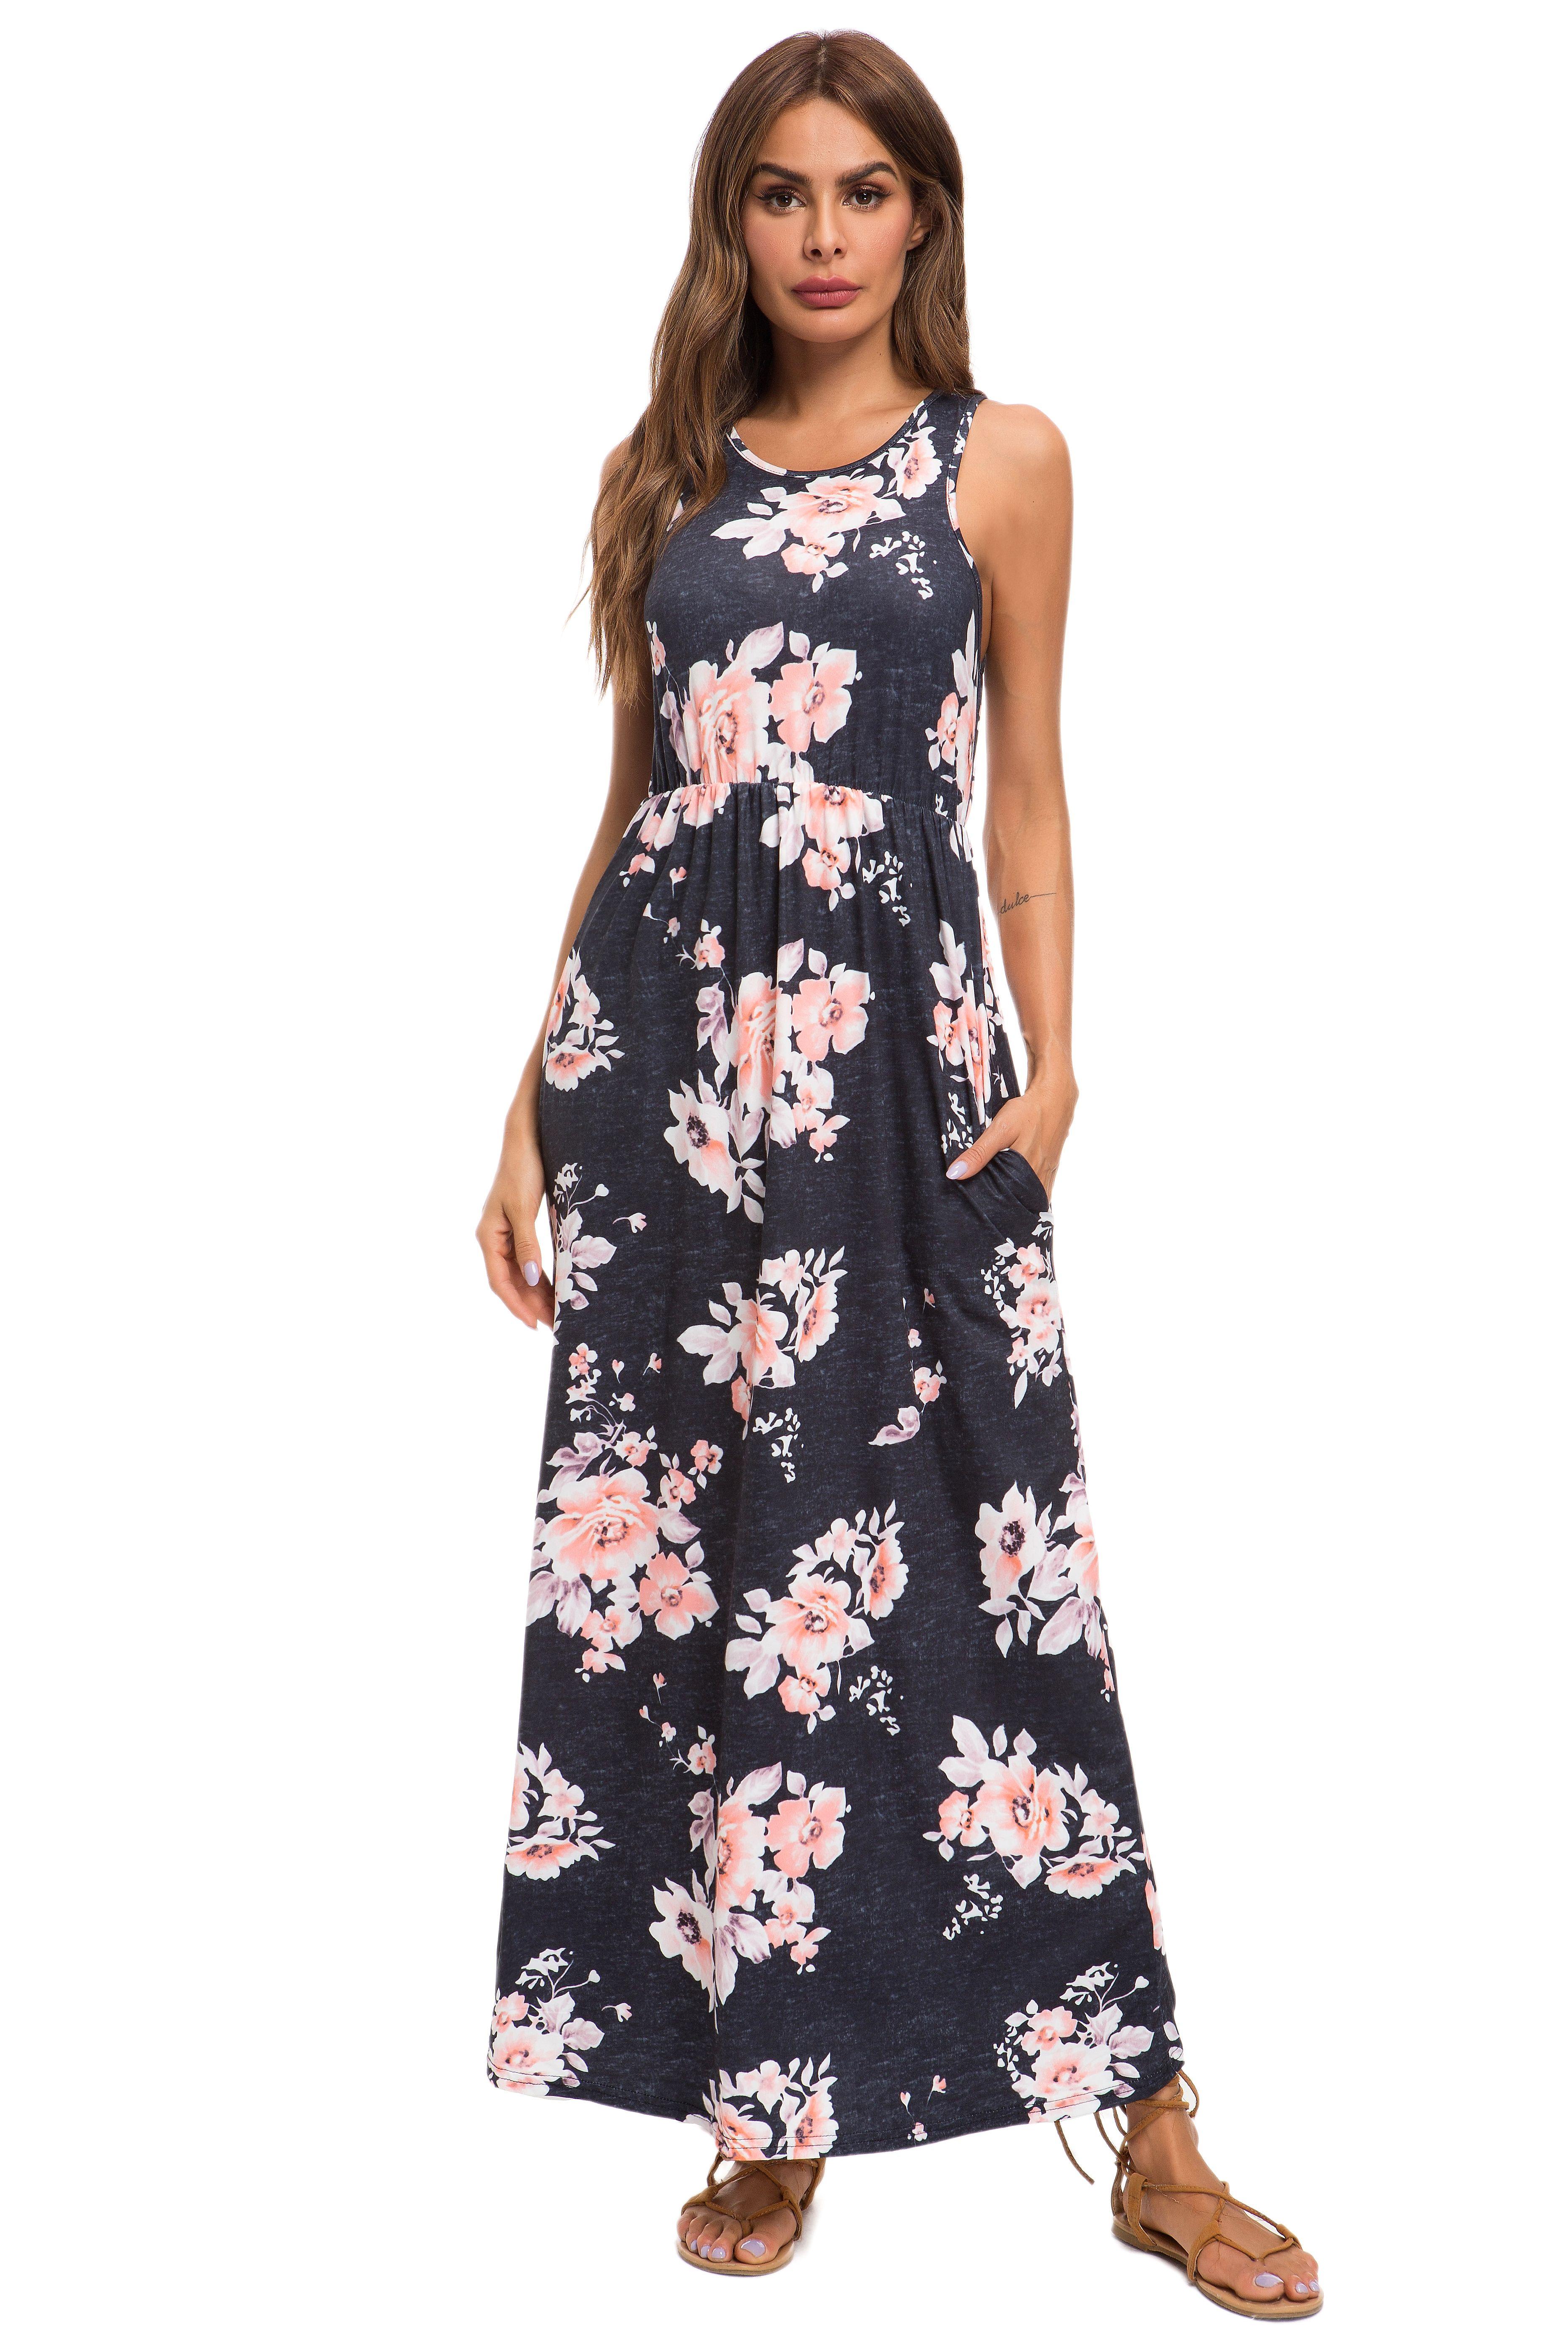 Heather Maxi Floral Dress Maxi Dress Dresses Printed Maxi Dress [ 5600 x 3733 Pixel ]